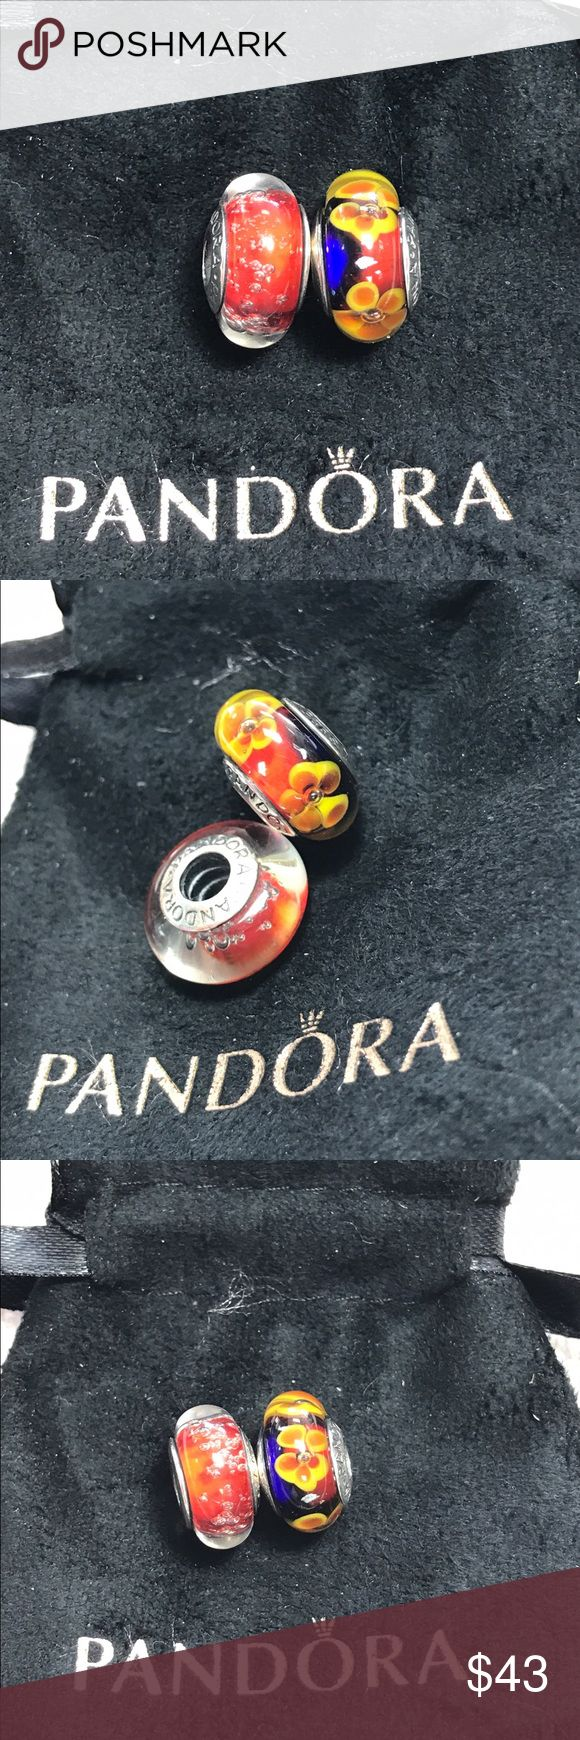 2 Pandora glass beads New. All Sterling Silver stamped 925. No trade Pandora Jewelry Bracelets